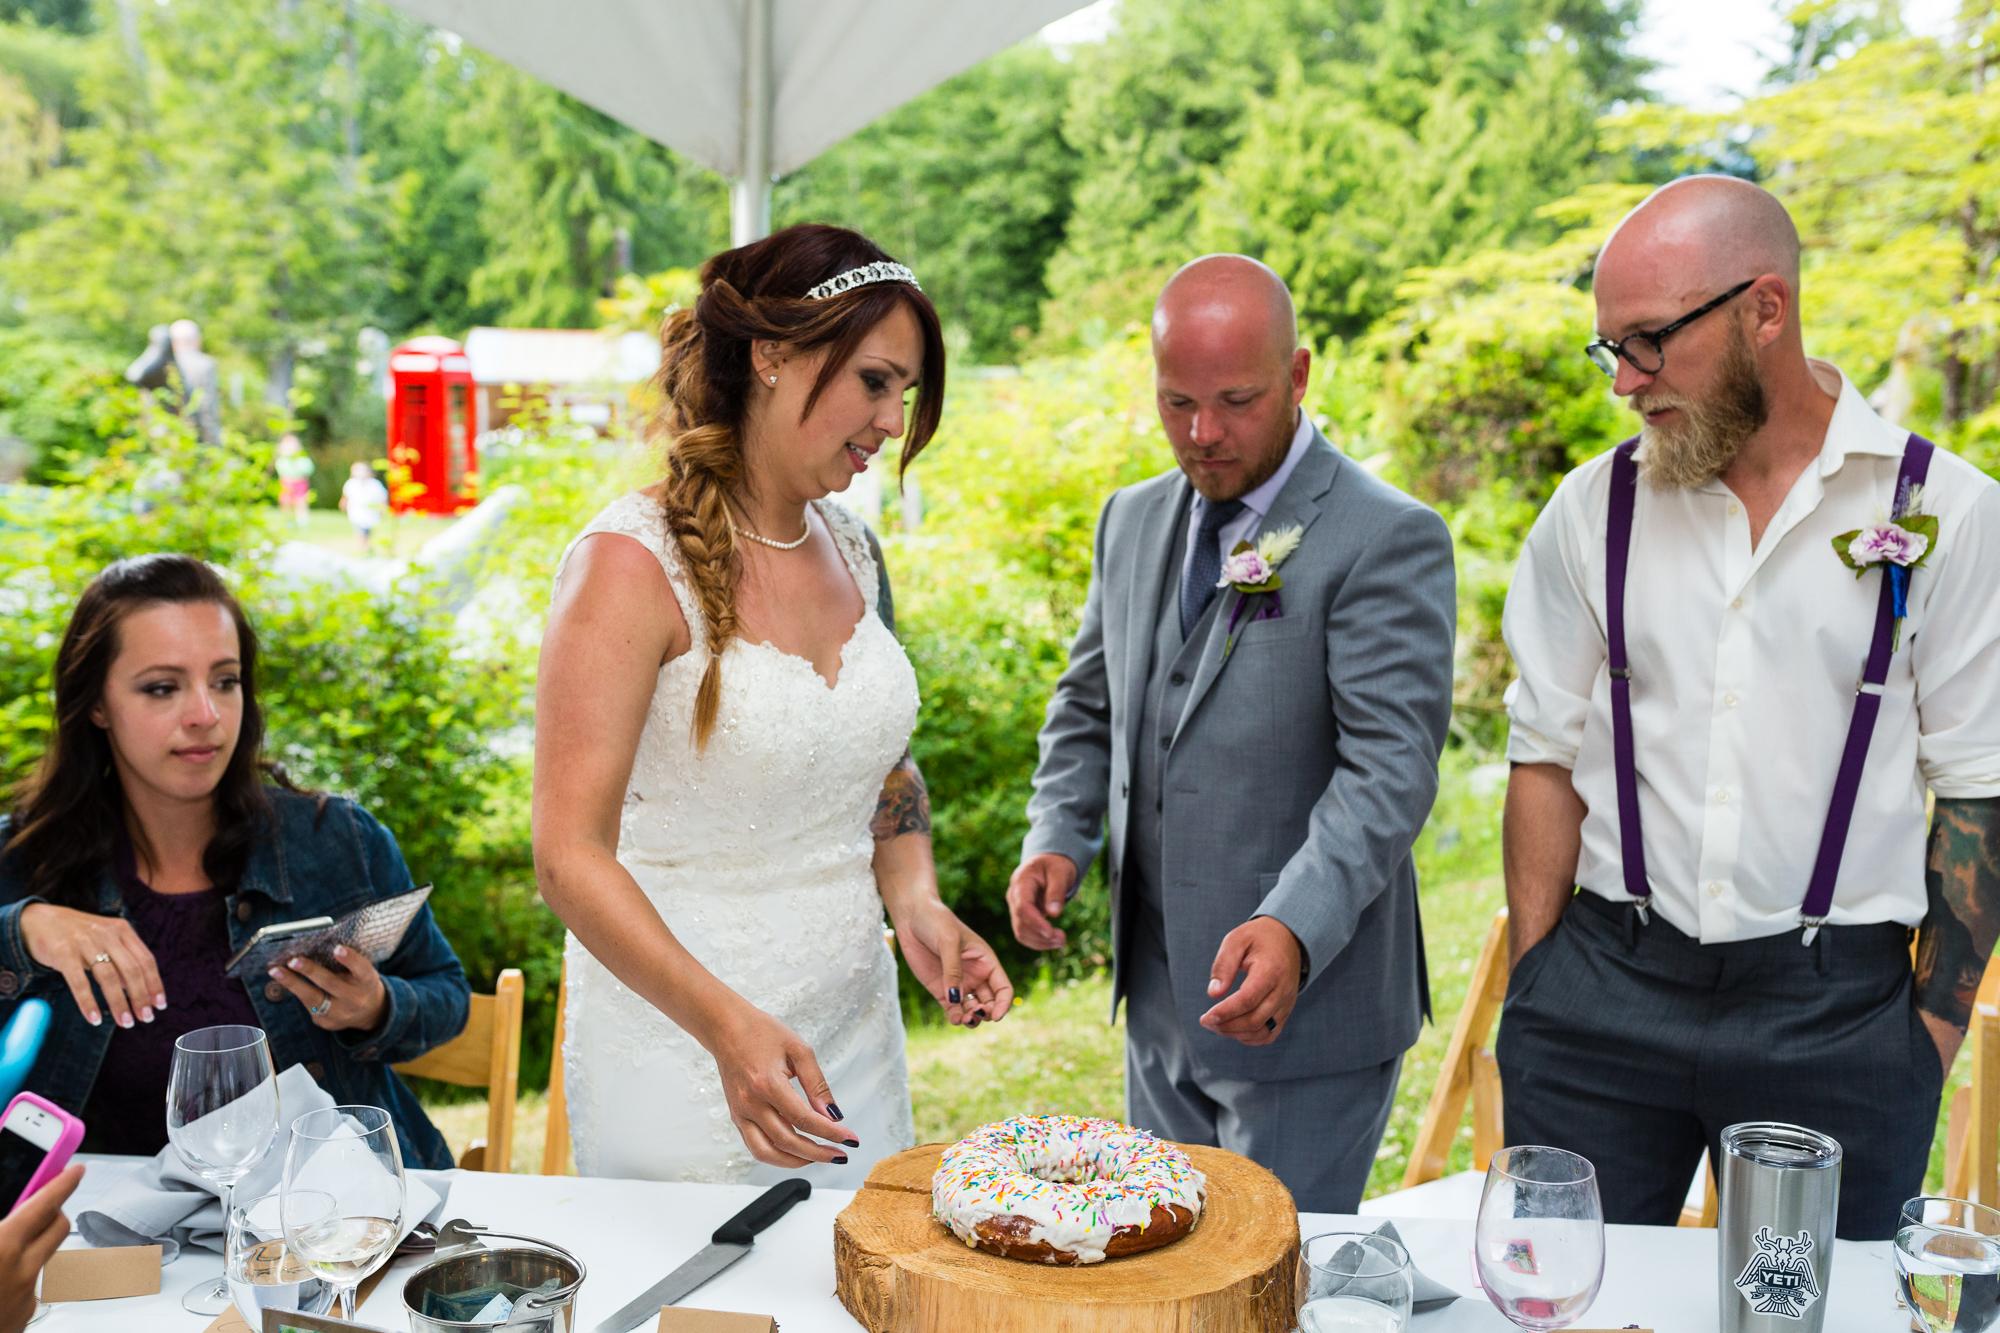 wedding donut cake cutting